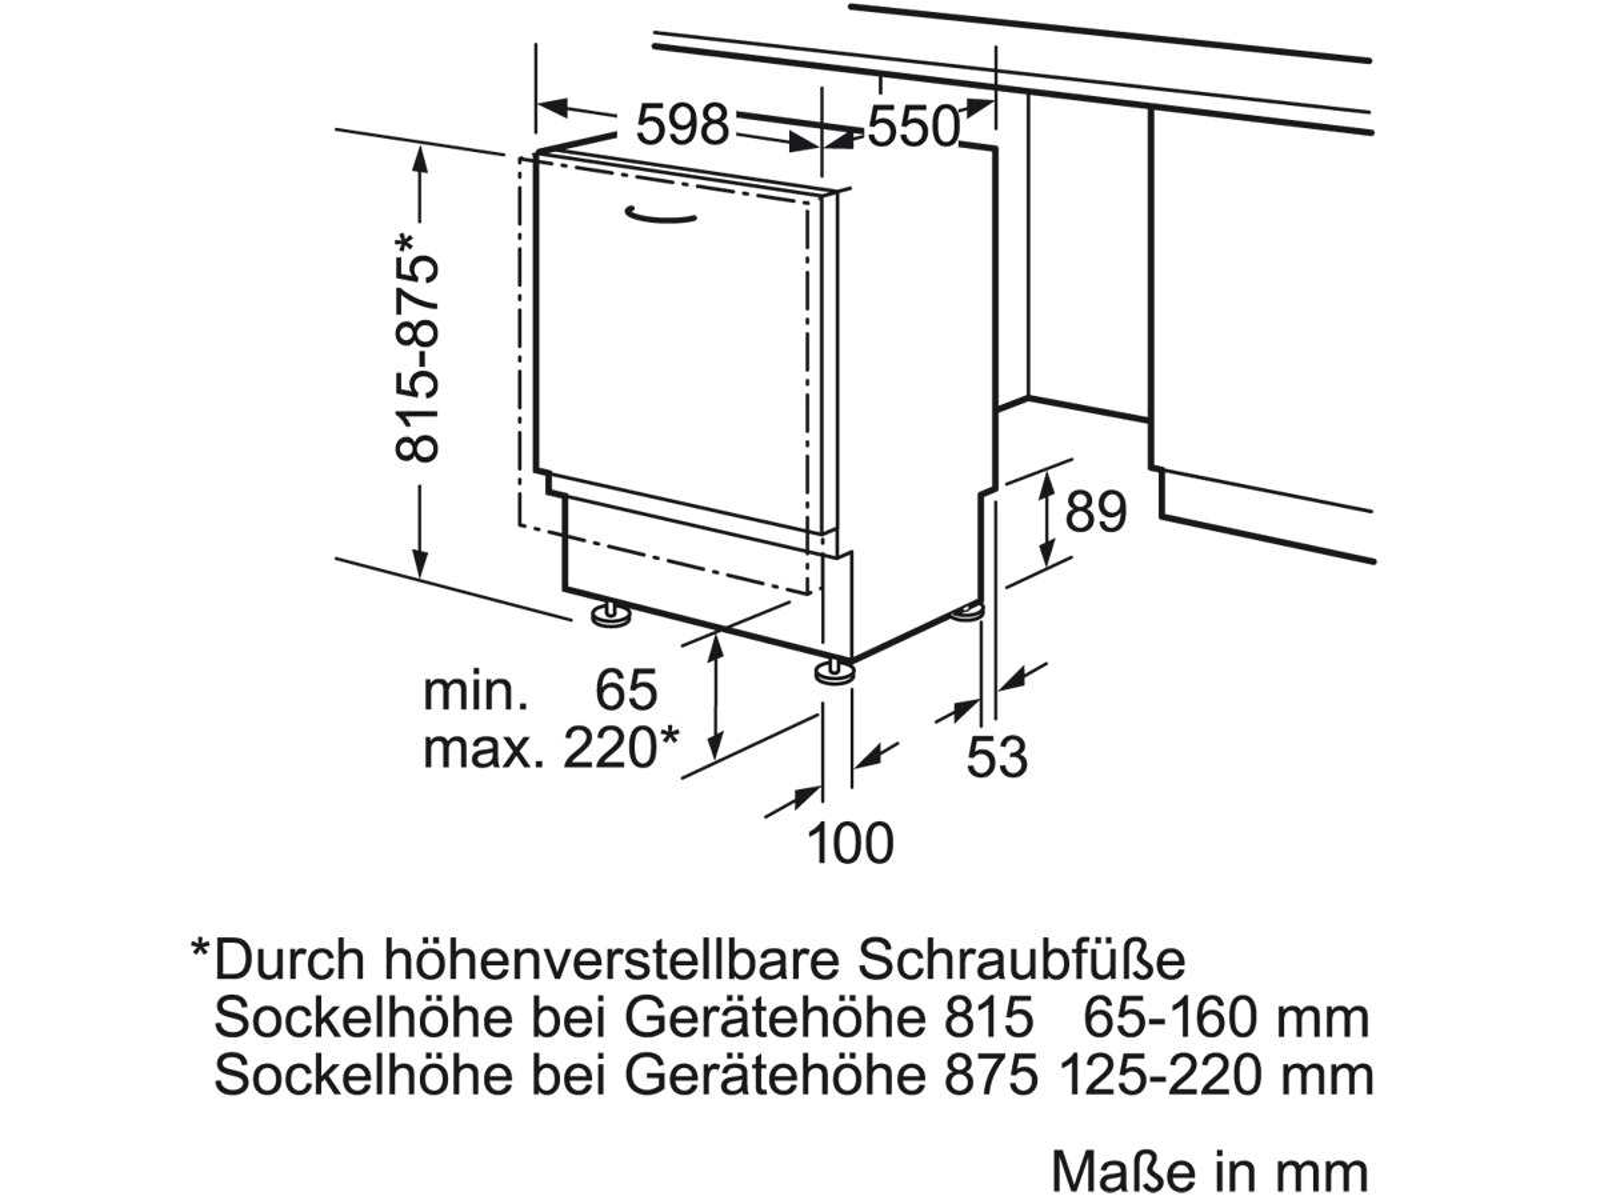 Bosch SBV54N31EU Vollintegrierbarer Einbaugeschirrspüler | {Einbaugeschirrspüler 89}